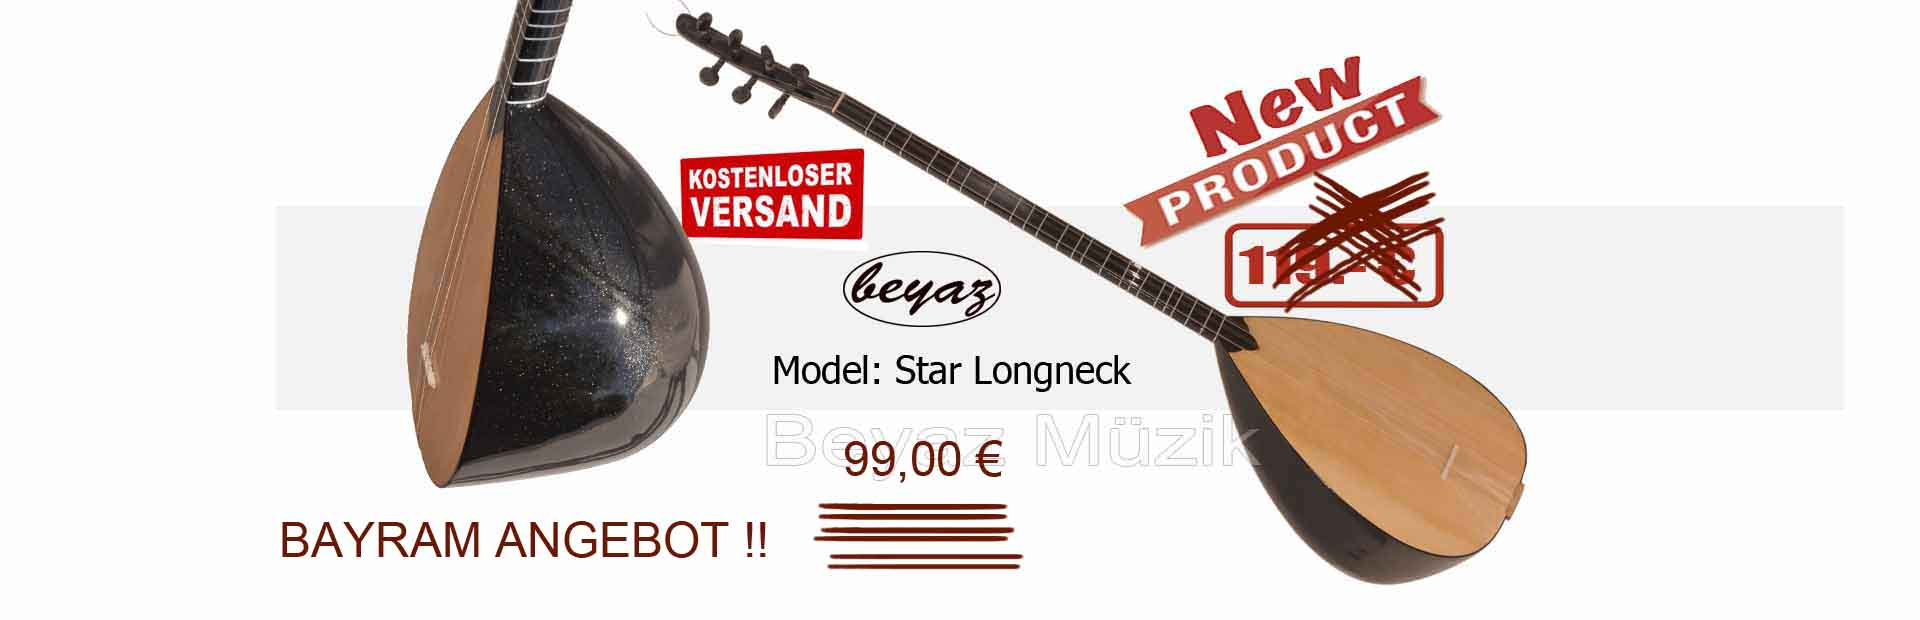 New Serie Longneck Model: Star